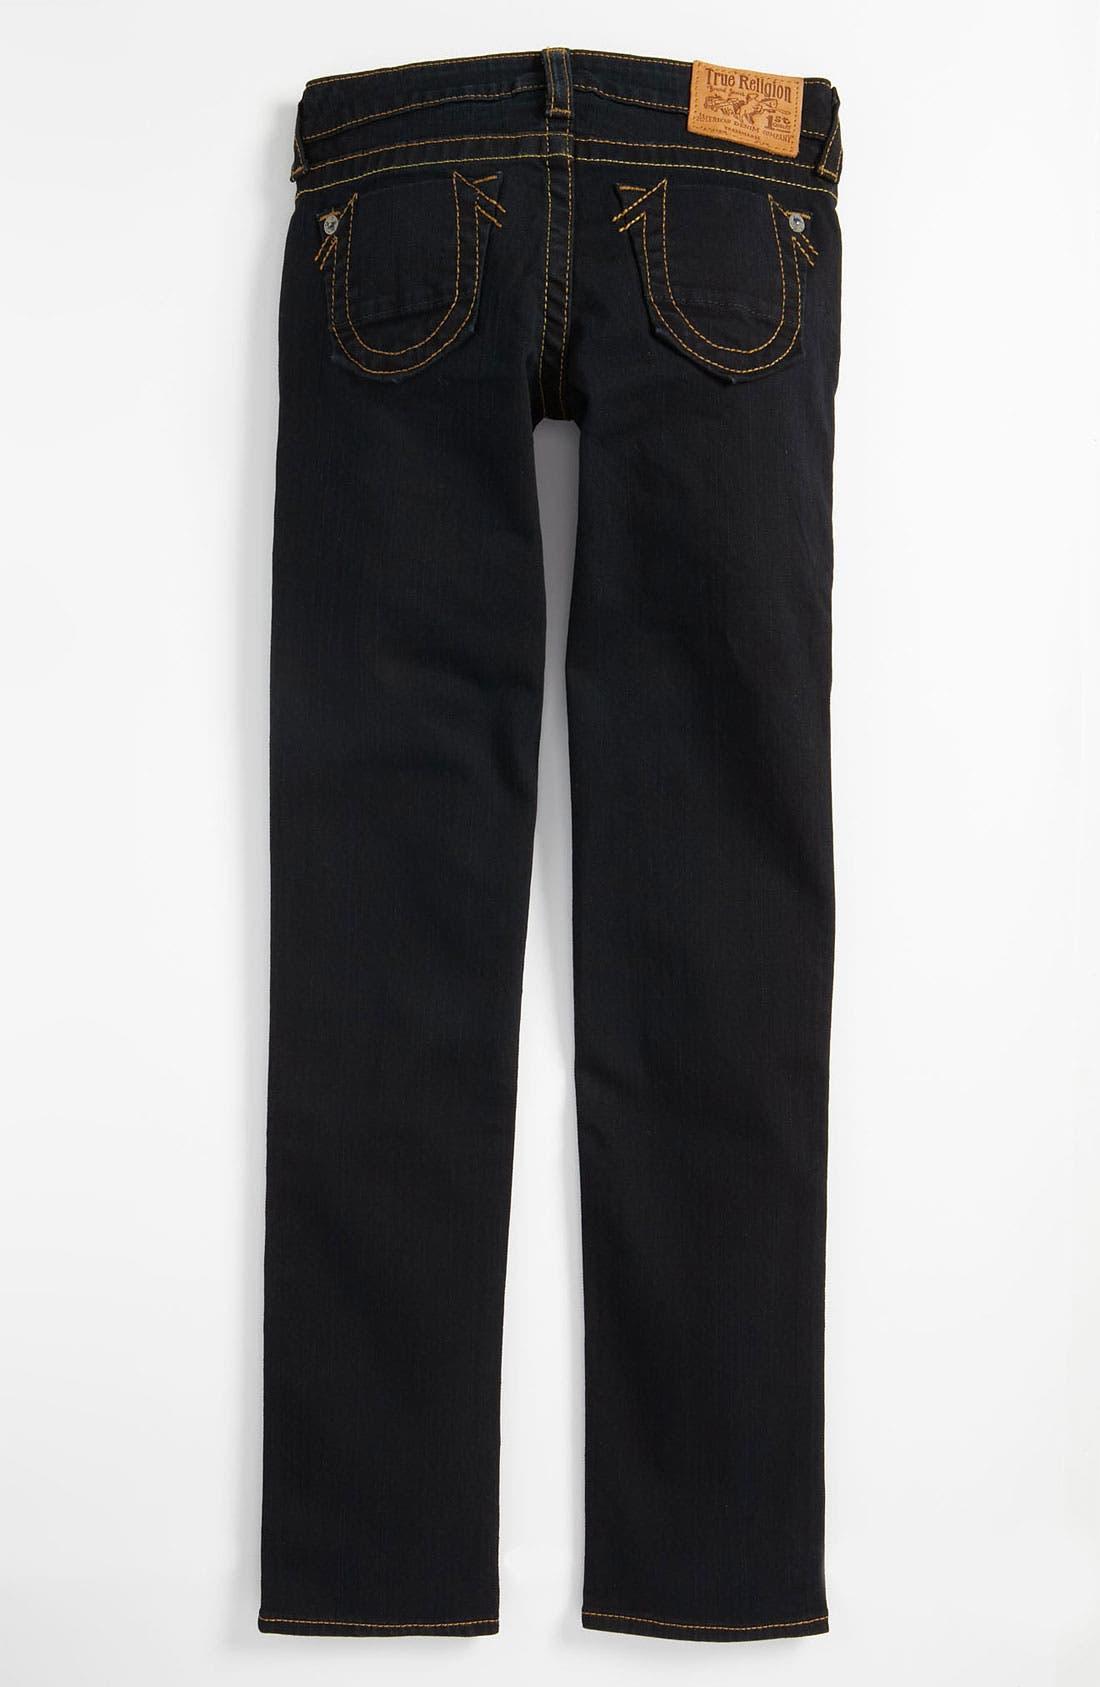 Alternate Image 1 Selected - True Religion Brand Jeans 'Stella' Skinny Jeans (Little Girls & Big Girls)